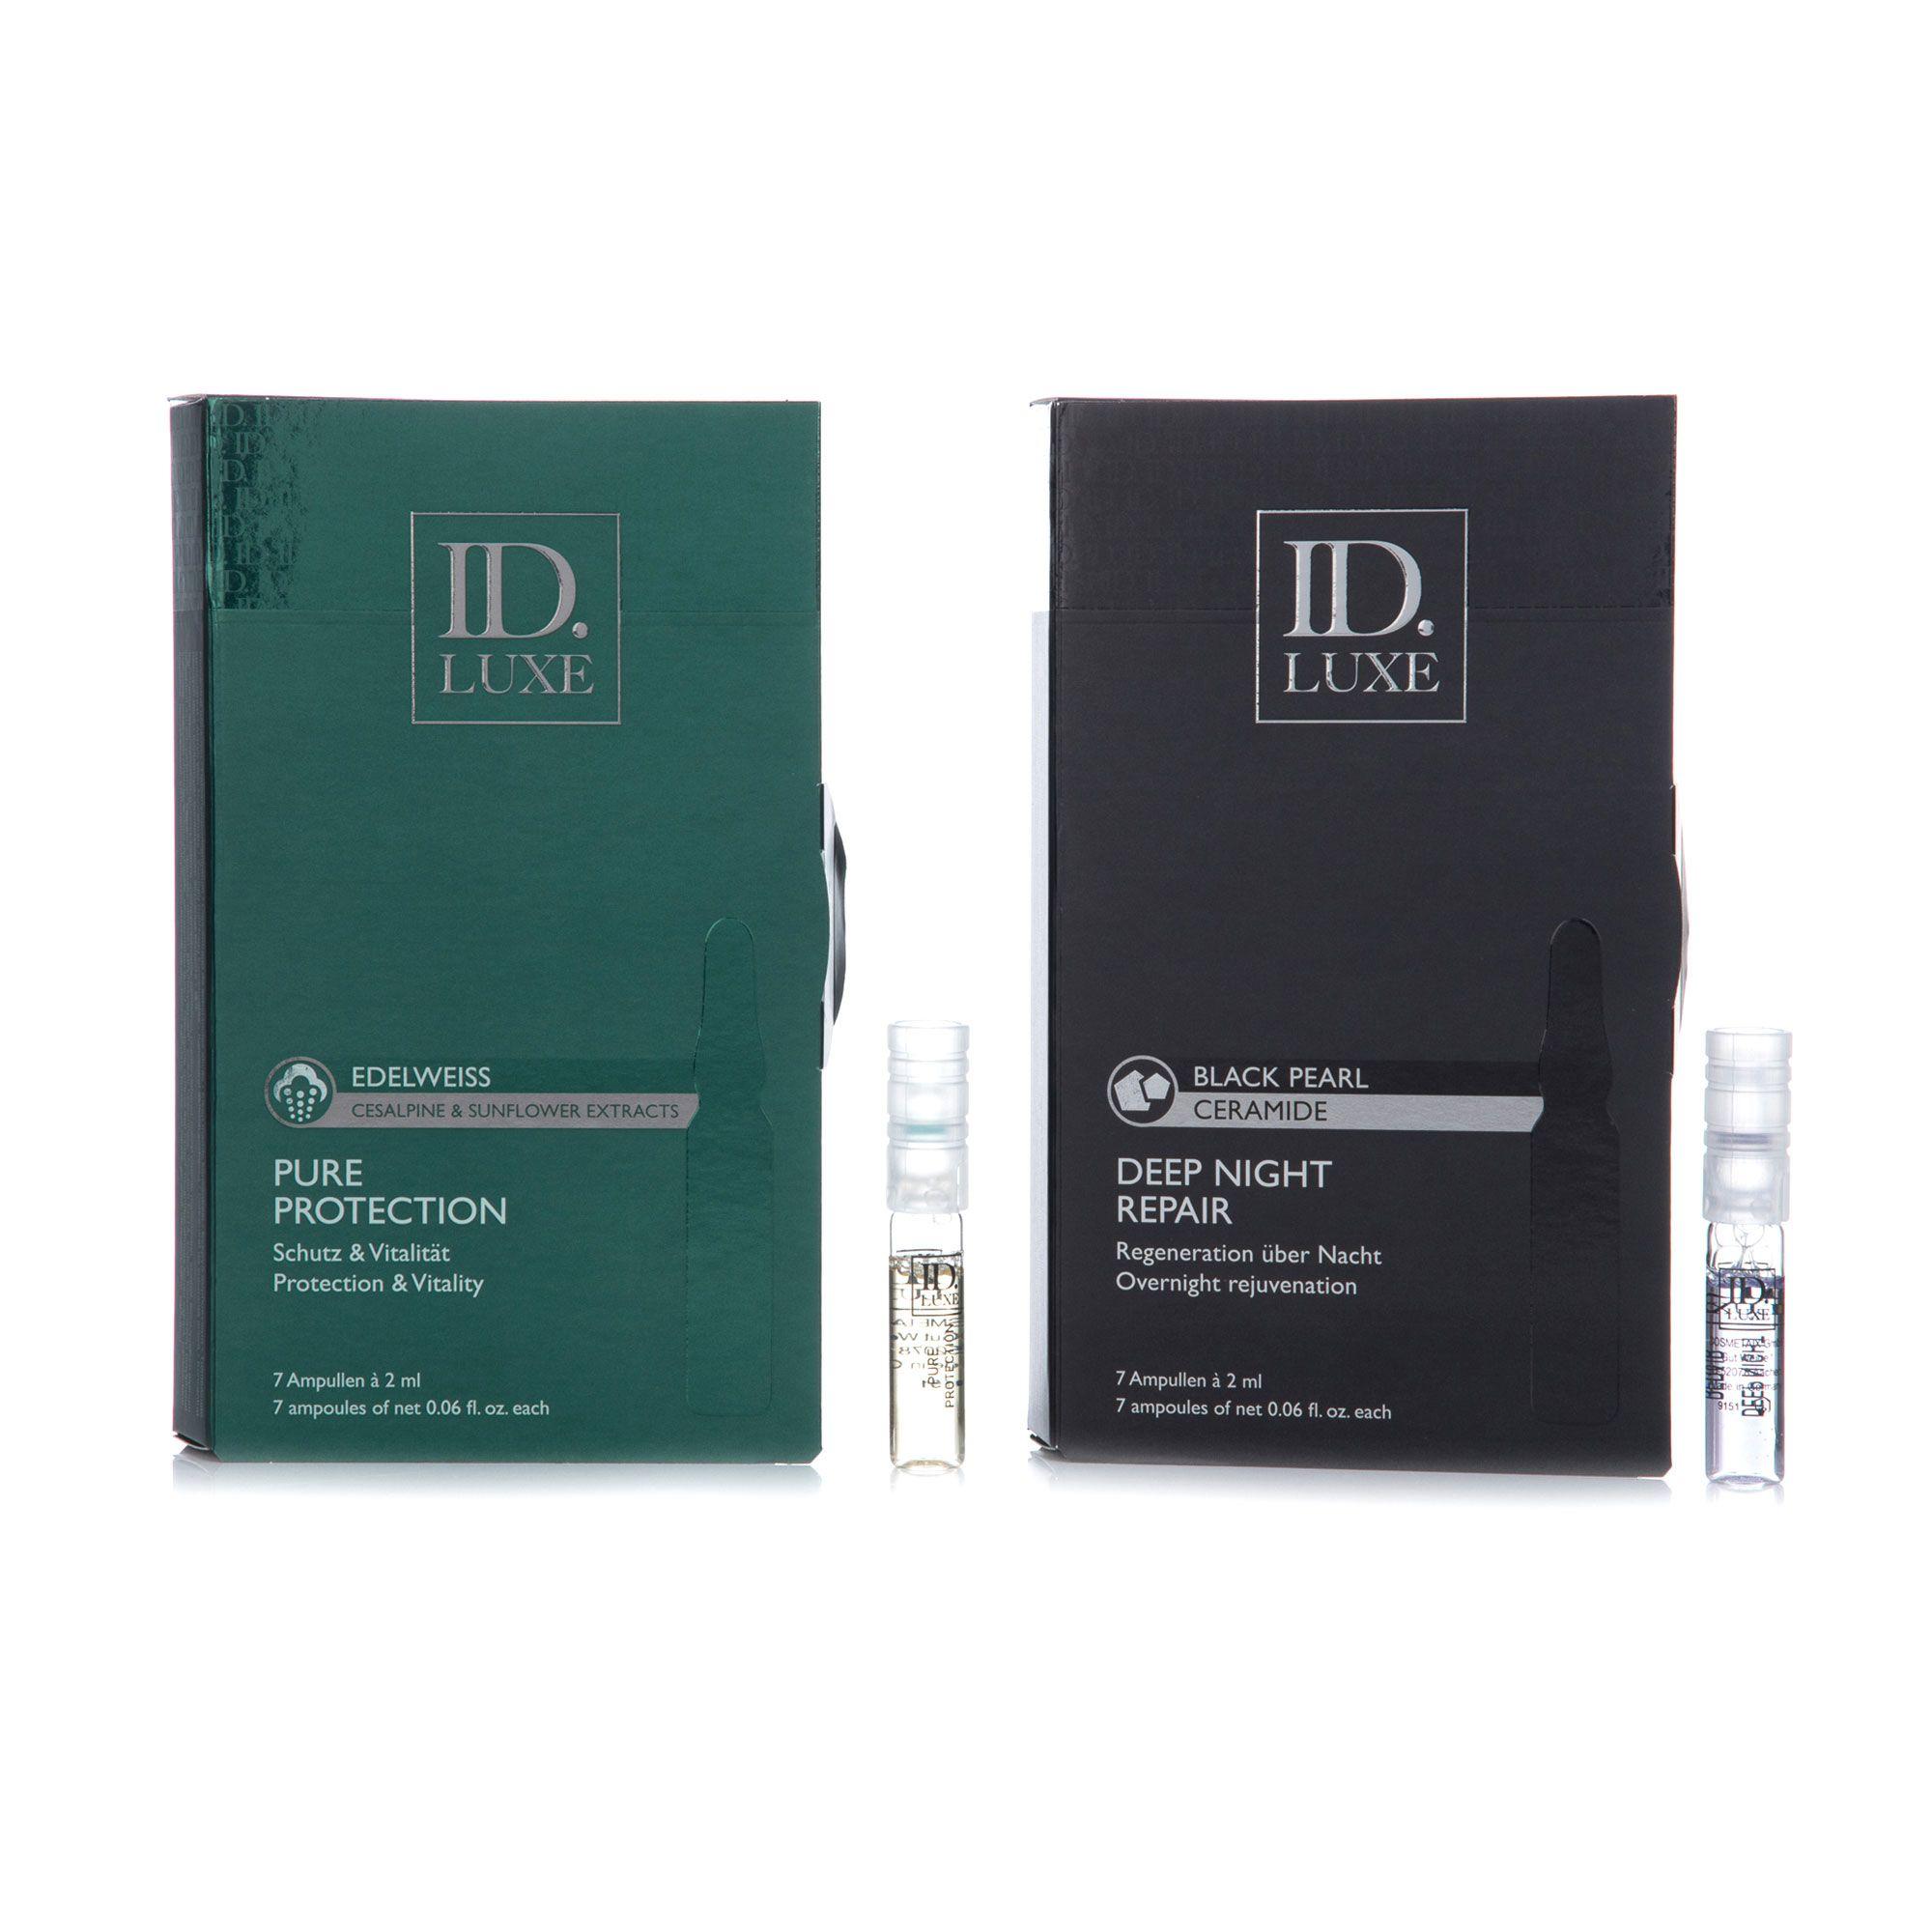 ID LUXE Pure Protection 7x 2ml & Deep Night Repair 7x 2ml